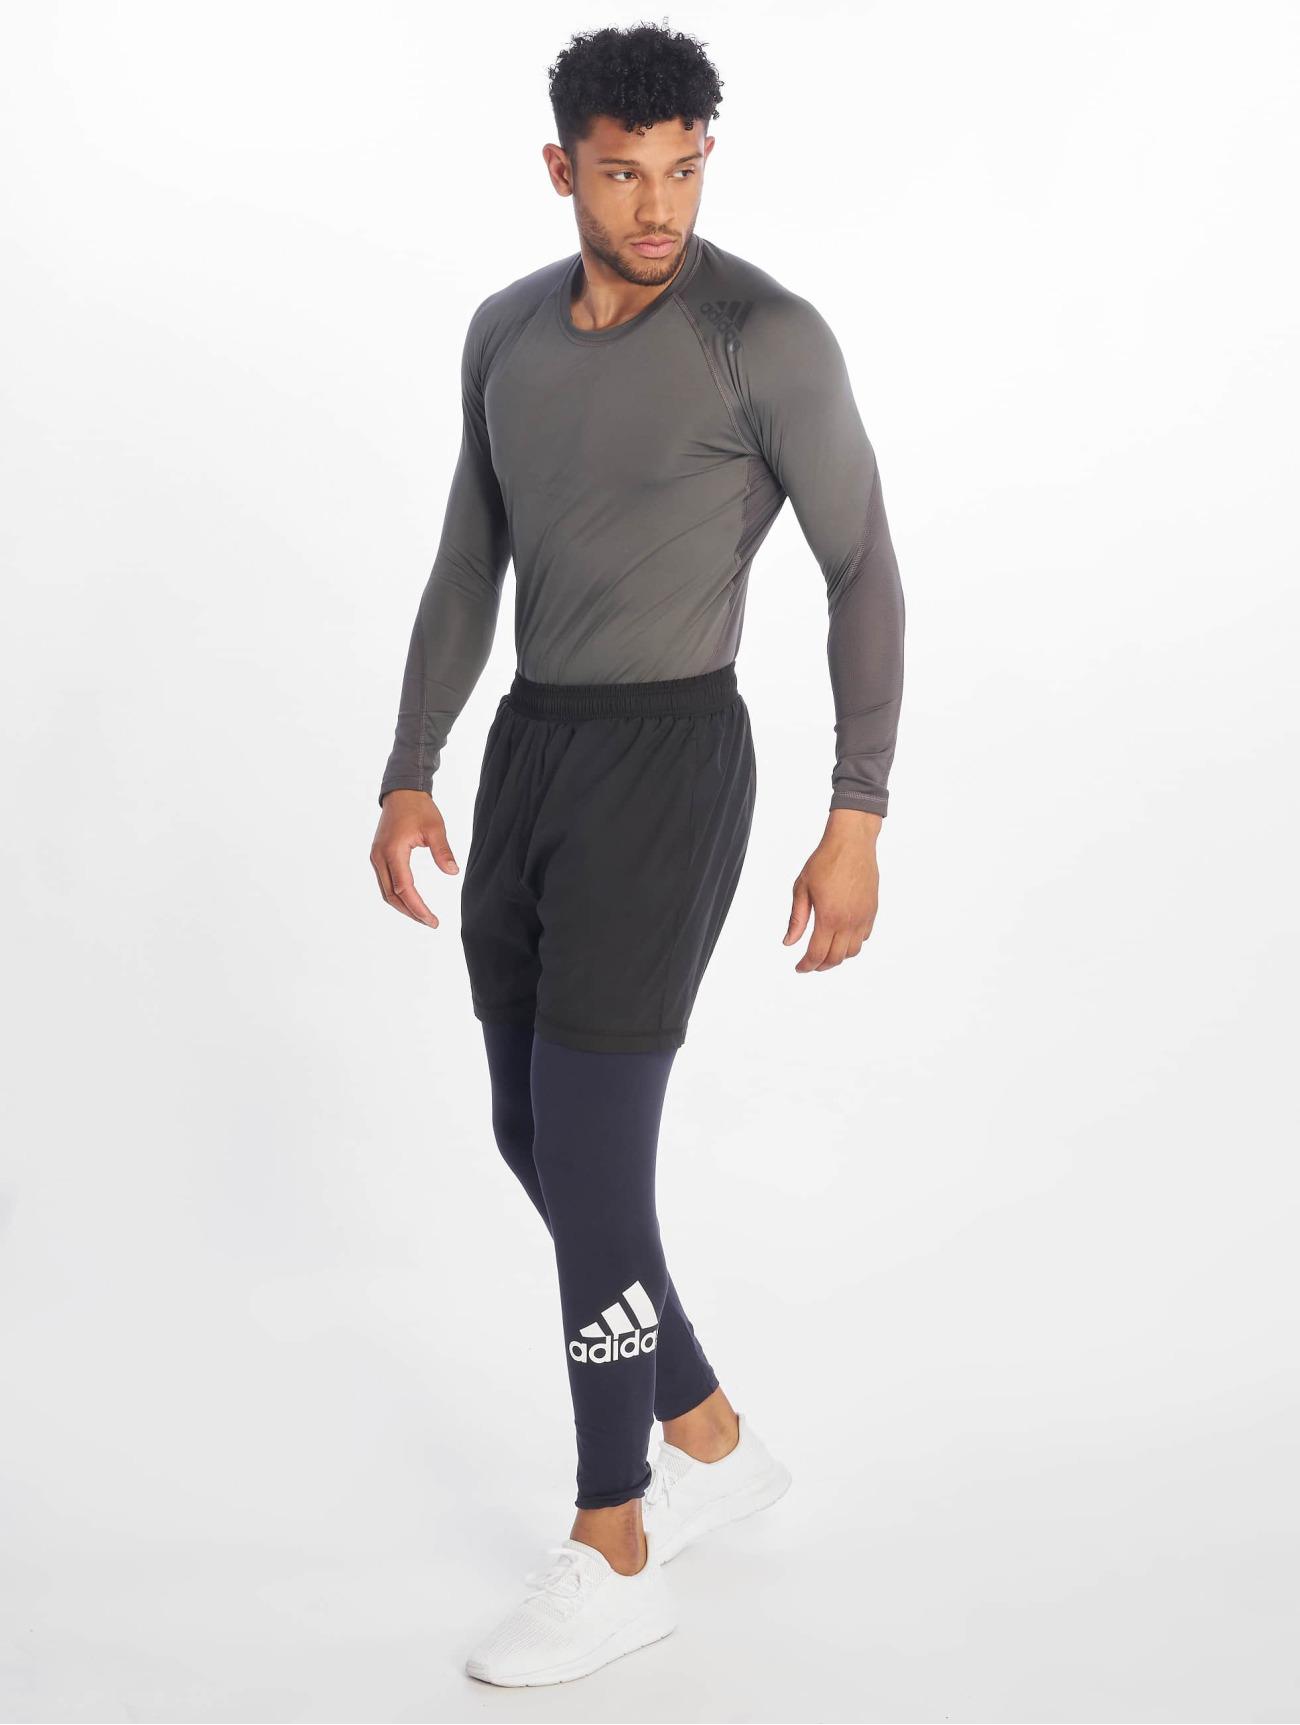 adidas Performance  Bos  bleu Homme Legging  618034 Homme Pantalons & Shorts